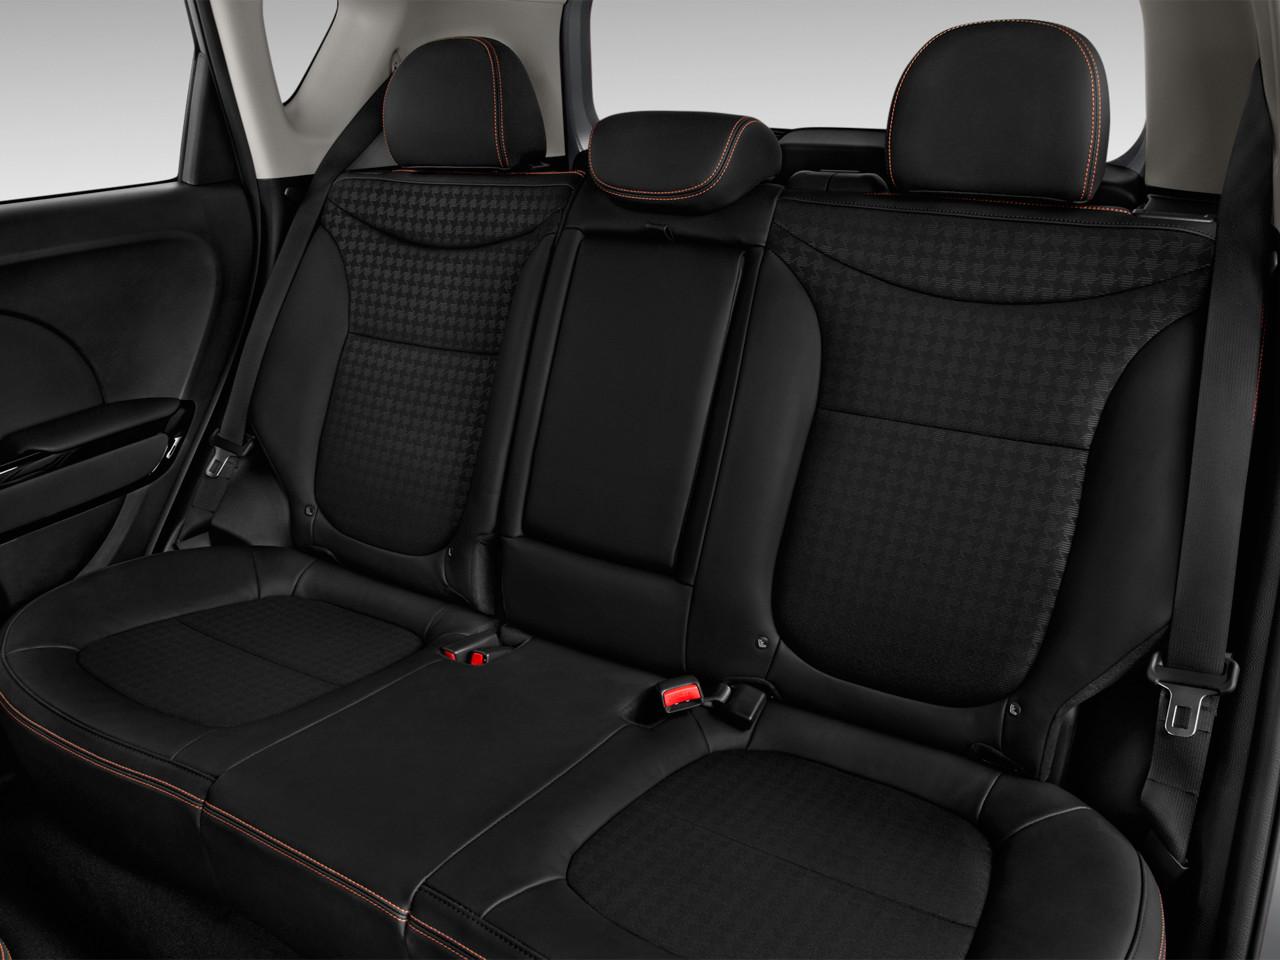 2016 ford mustang interior u s news amp world report - 2016 Ford Mustang Interior U S News Amp World Report 15